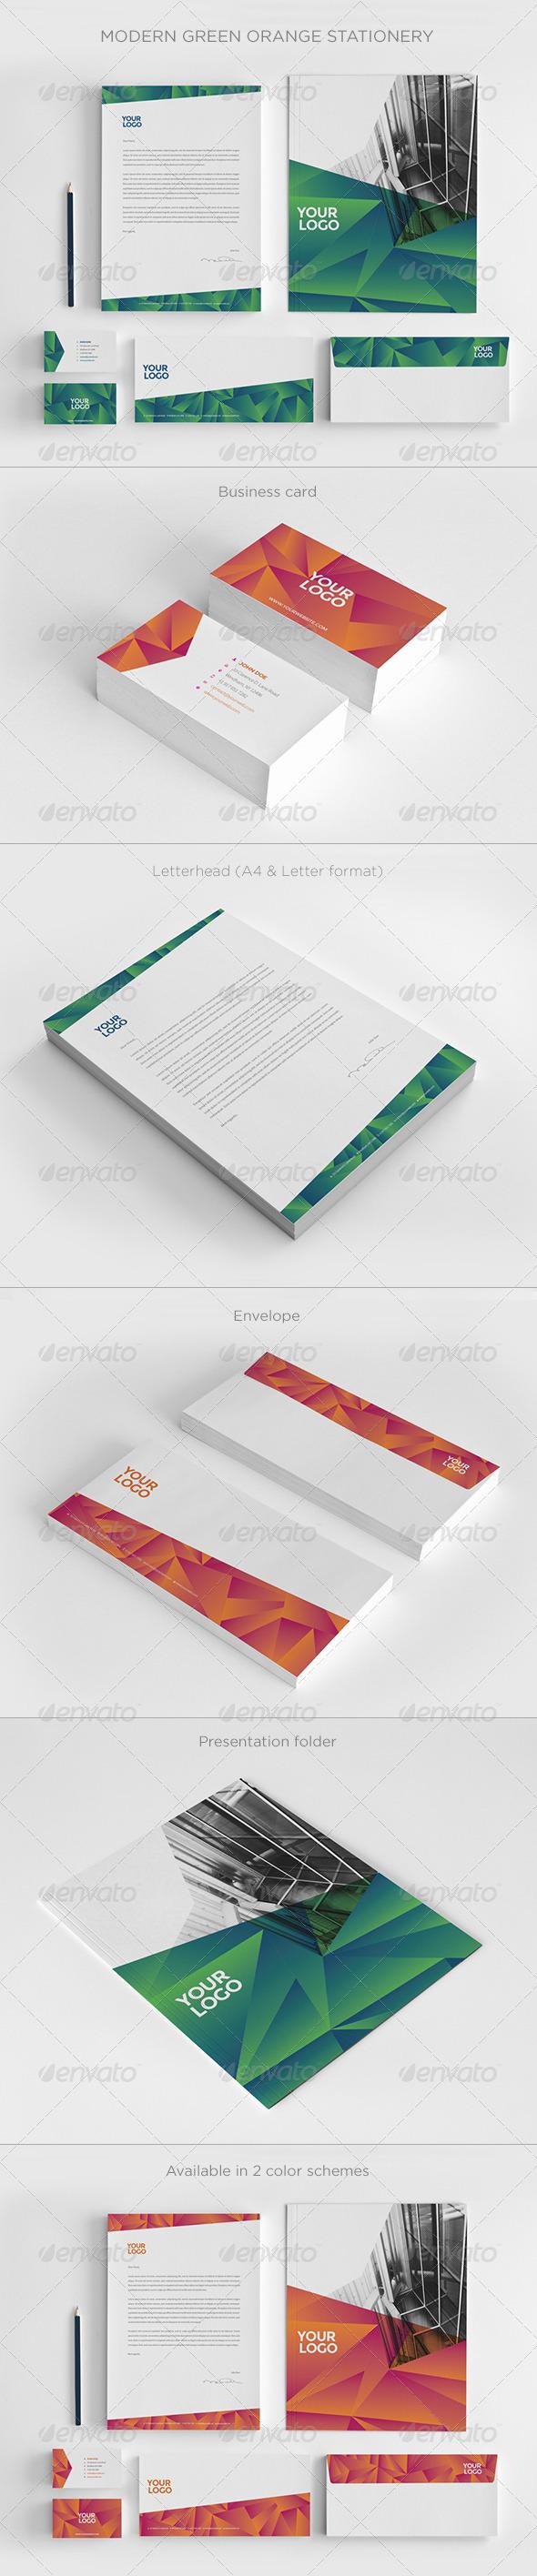 GraphicRiver Modern Green Orange Stationery 7822754